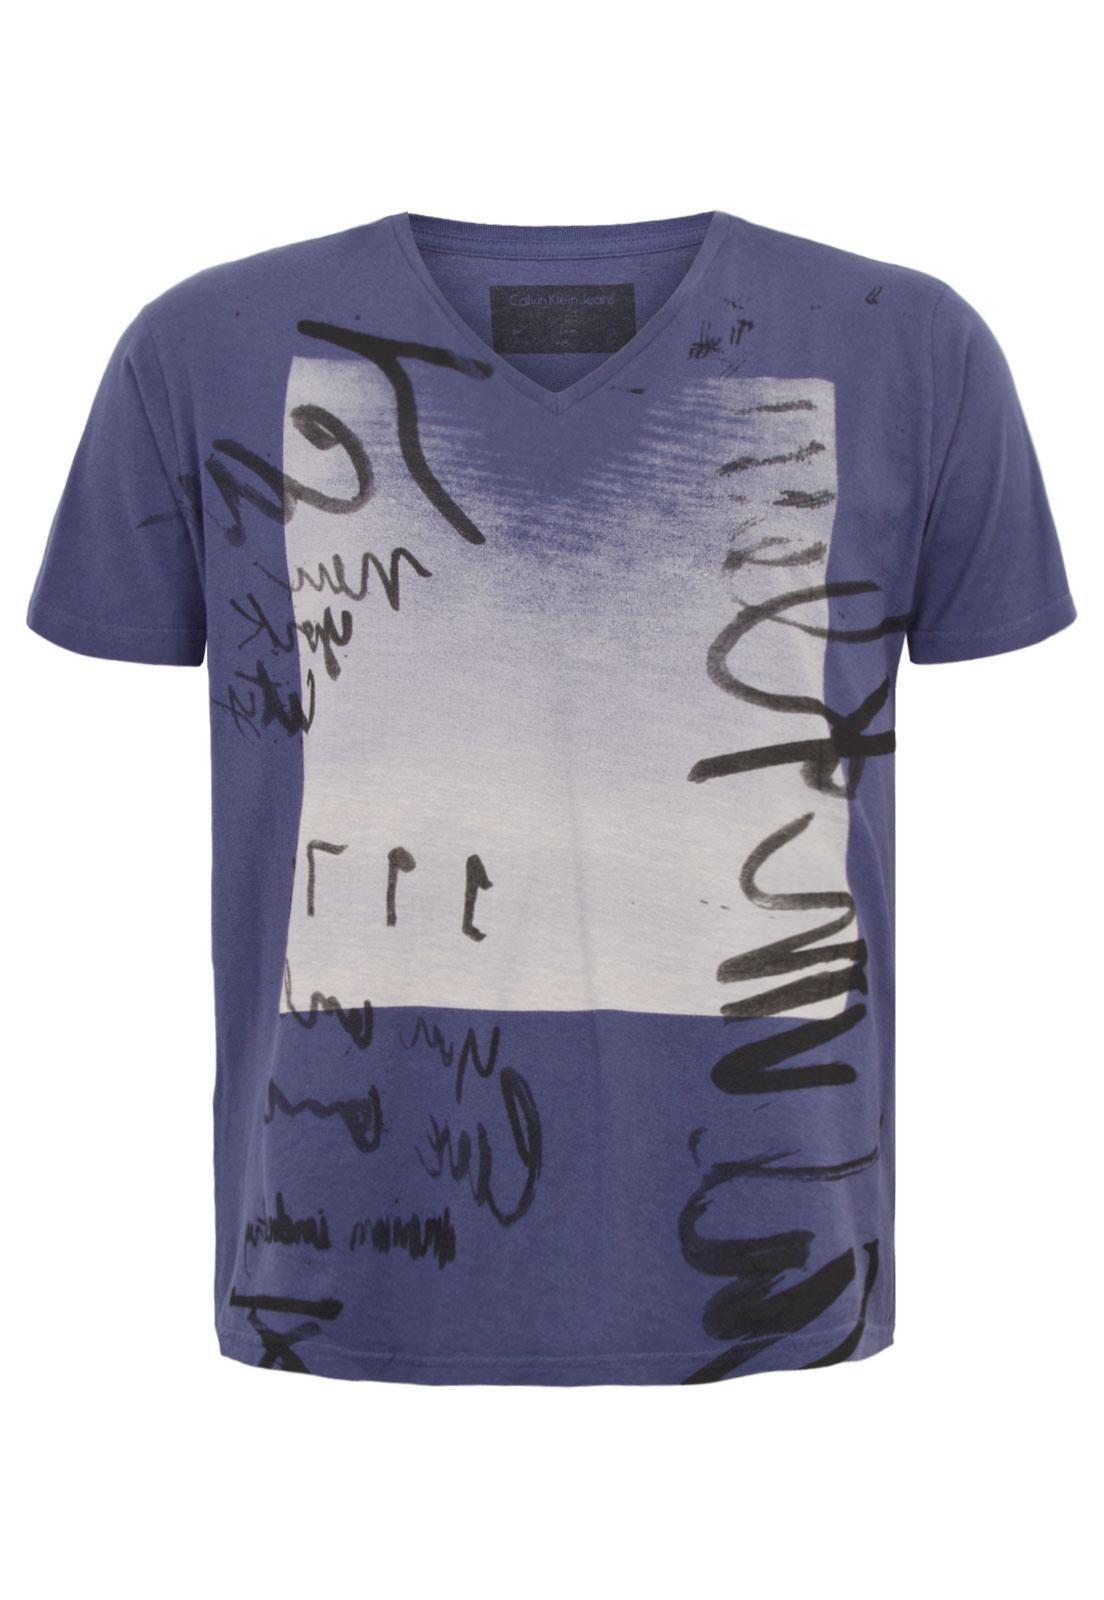 Calvin Klein   Tees liked in 2018   Pinterest   Shirts, Calvin klein ... e94648c0a9